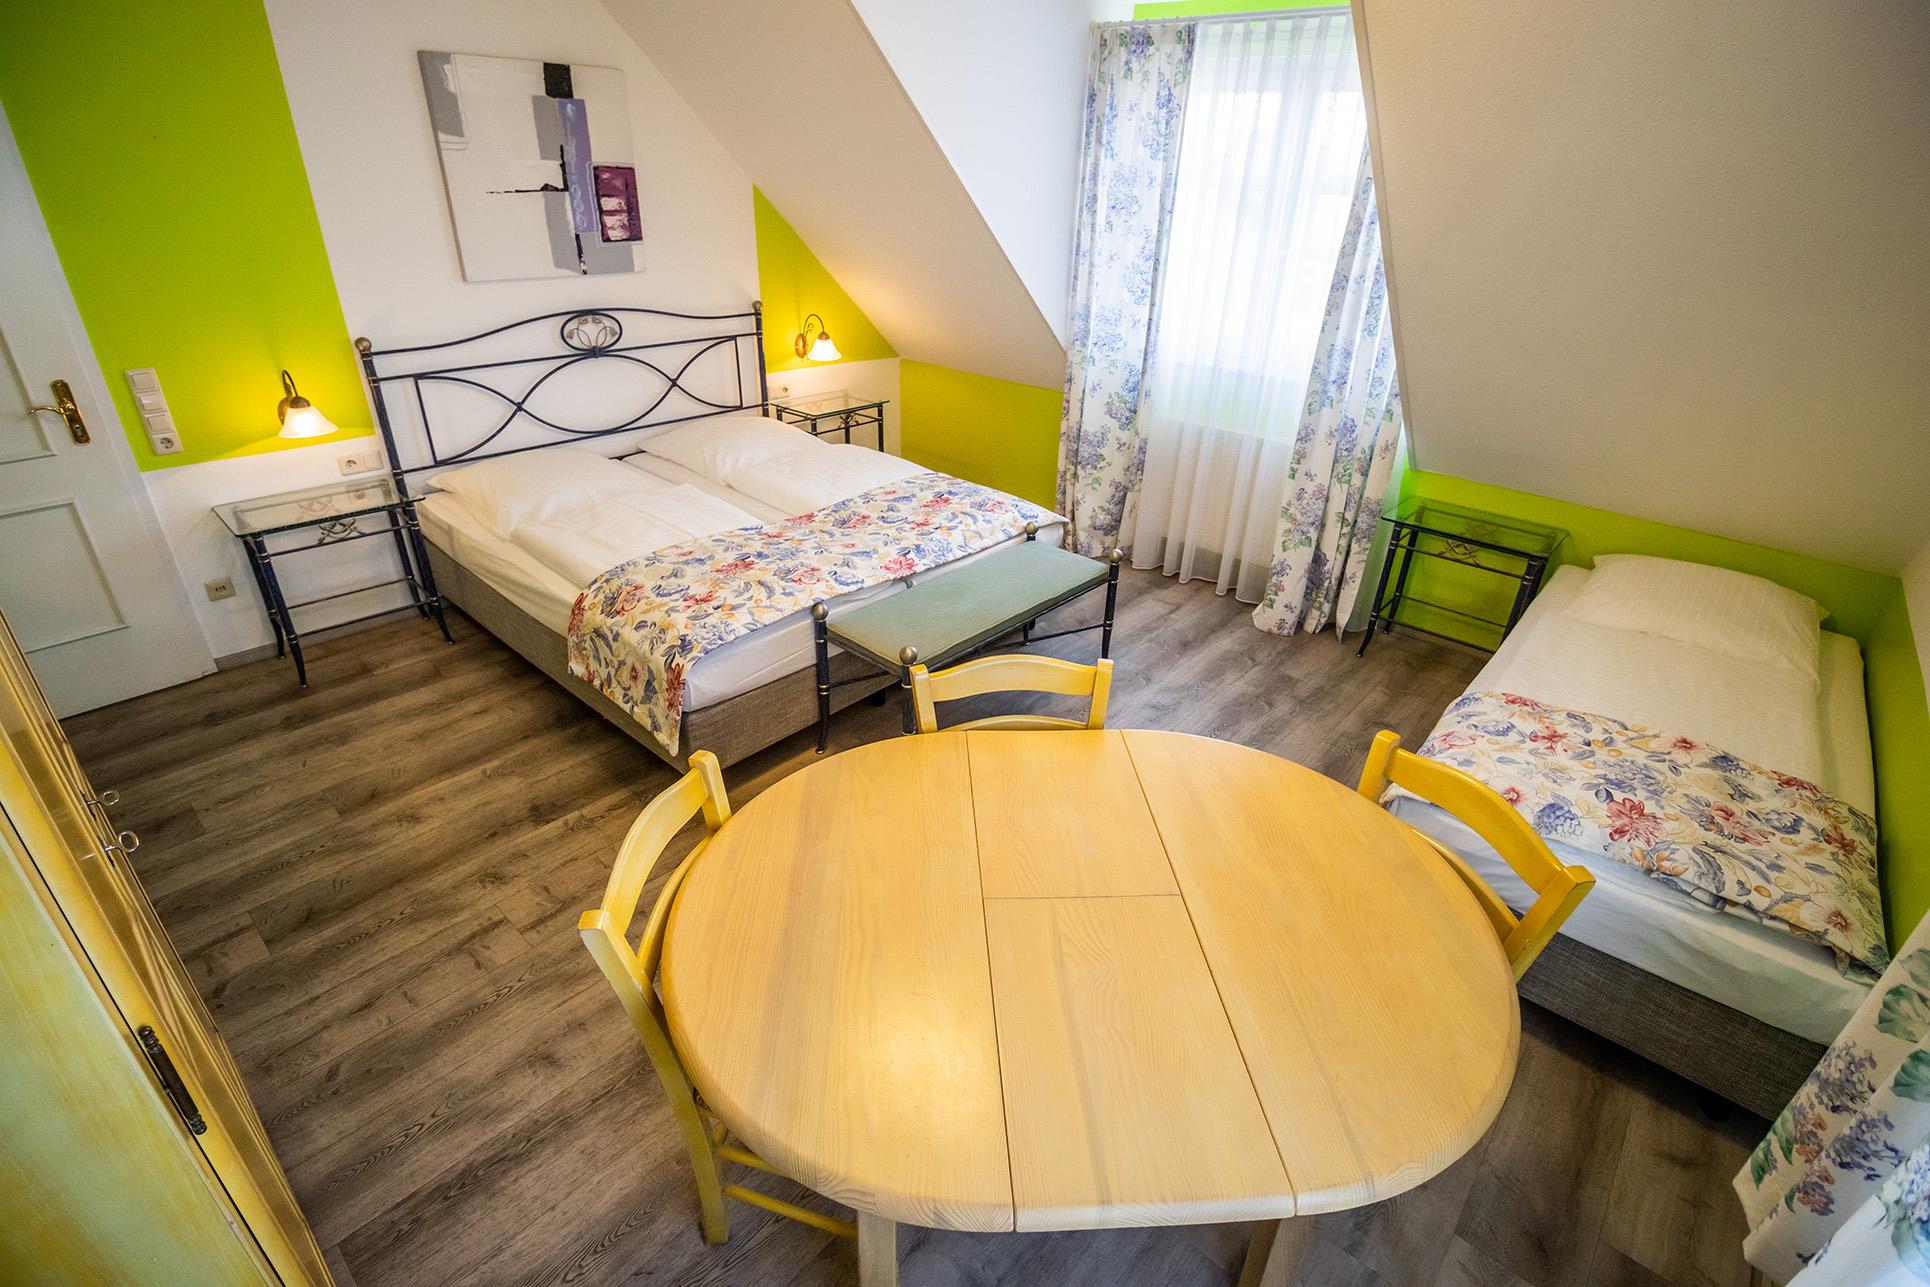 Hotel Rössle Weingarten 3-Bett-Zimmer